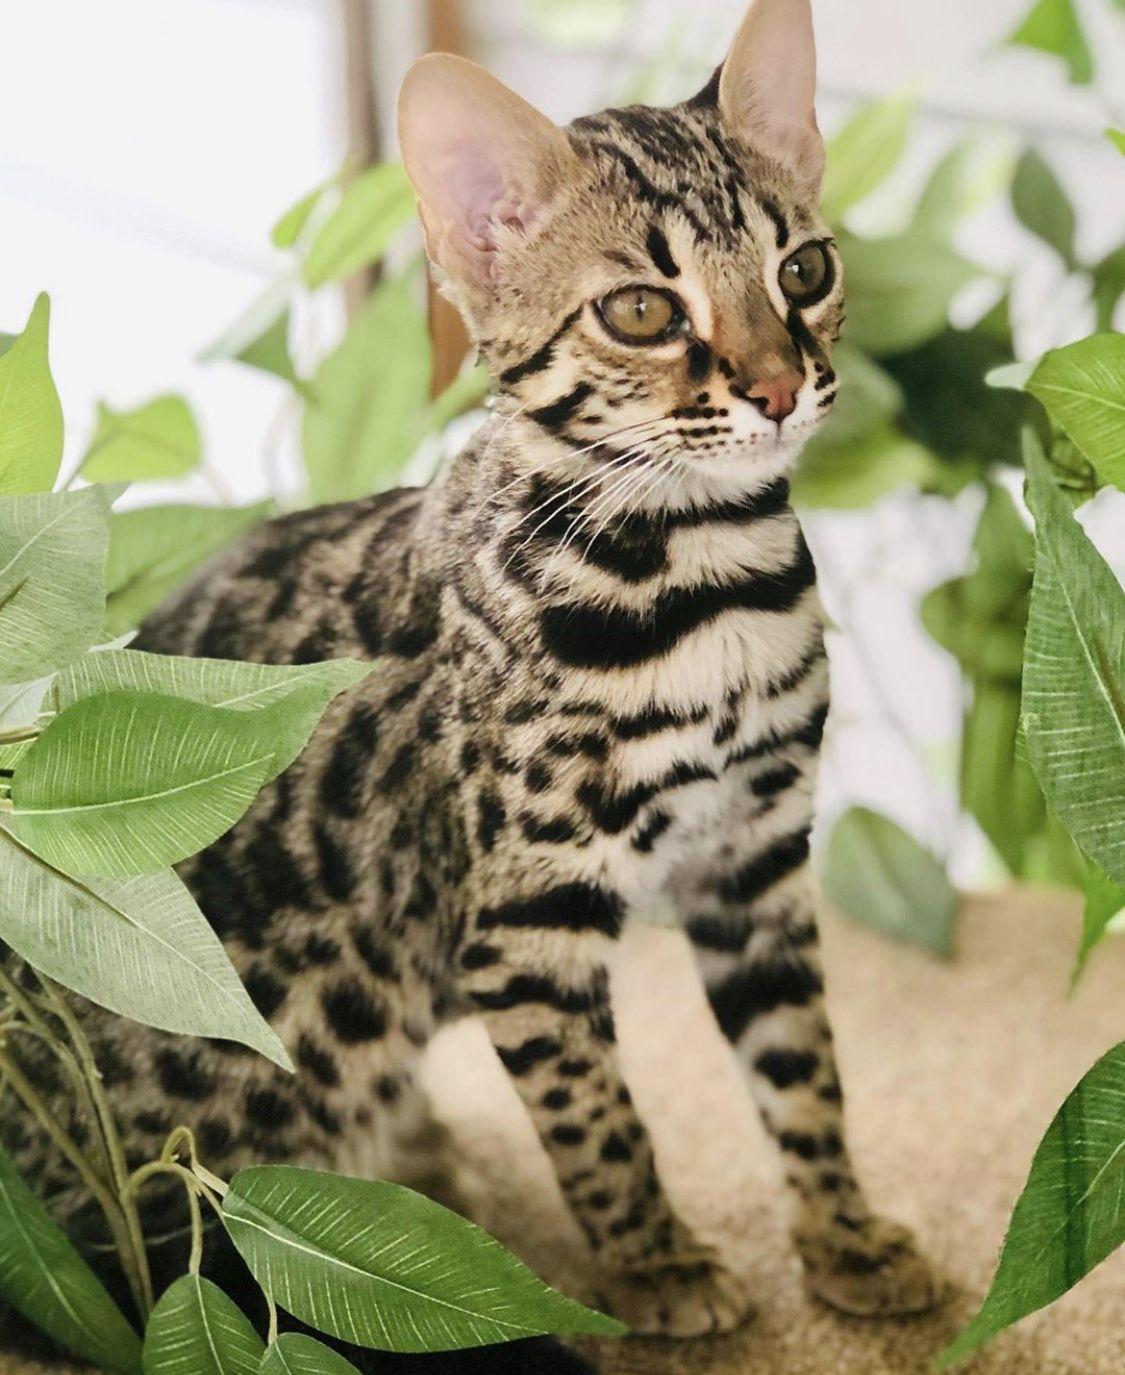 F1 Bengal Breeder In 2020 Savannah Cat Breeders Cats And Kittens Savannah Kitten